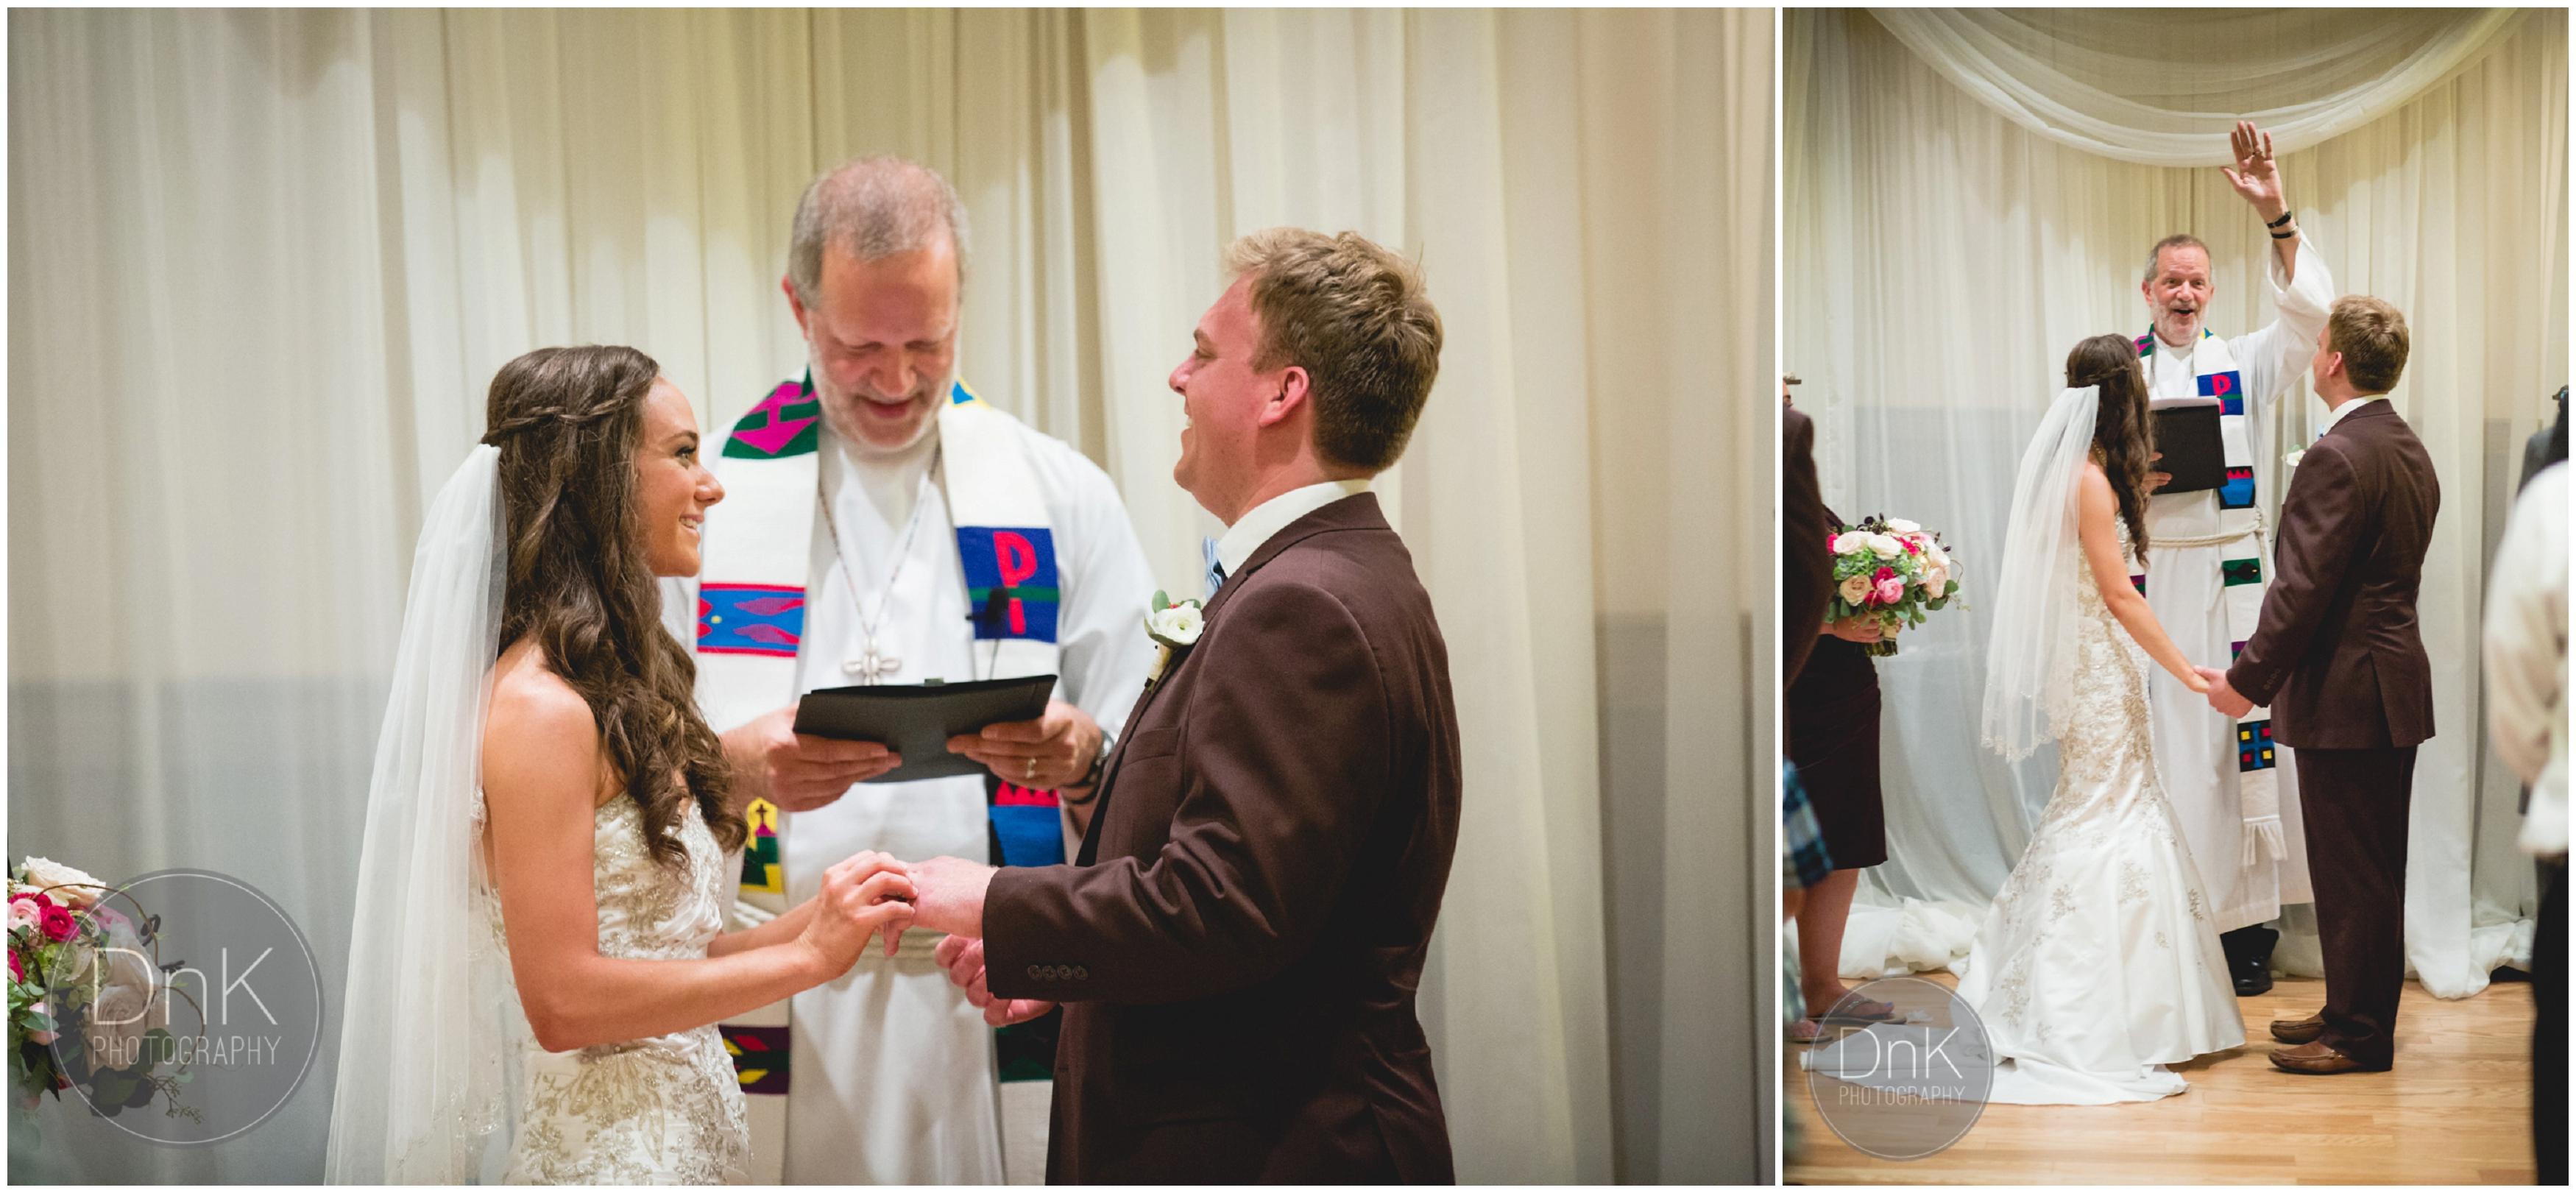 21 - 413 on Wacouta Wedding Ceremony